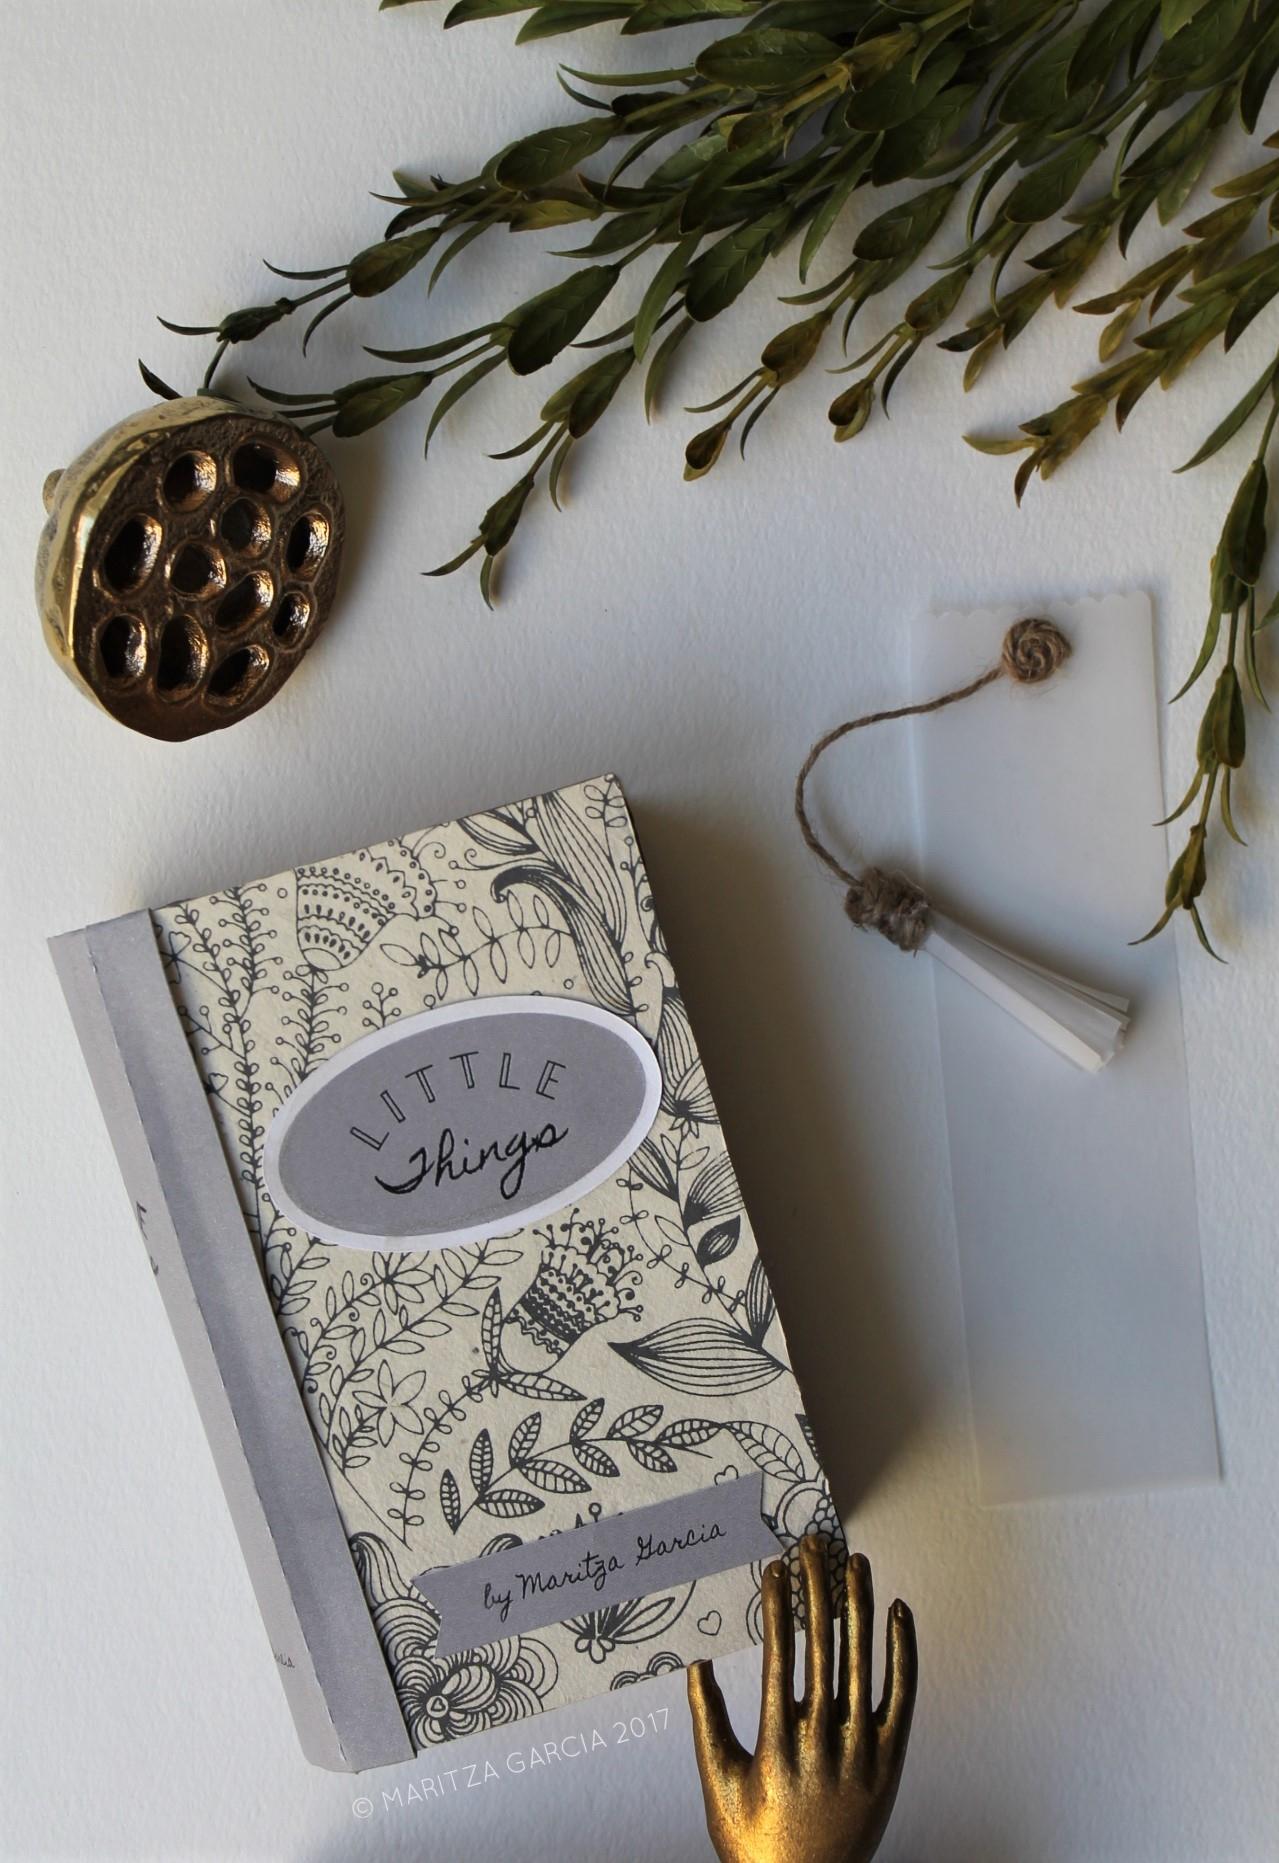 Silhouette Hidden Compartment Book Box   maritzagarcia.website